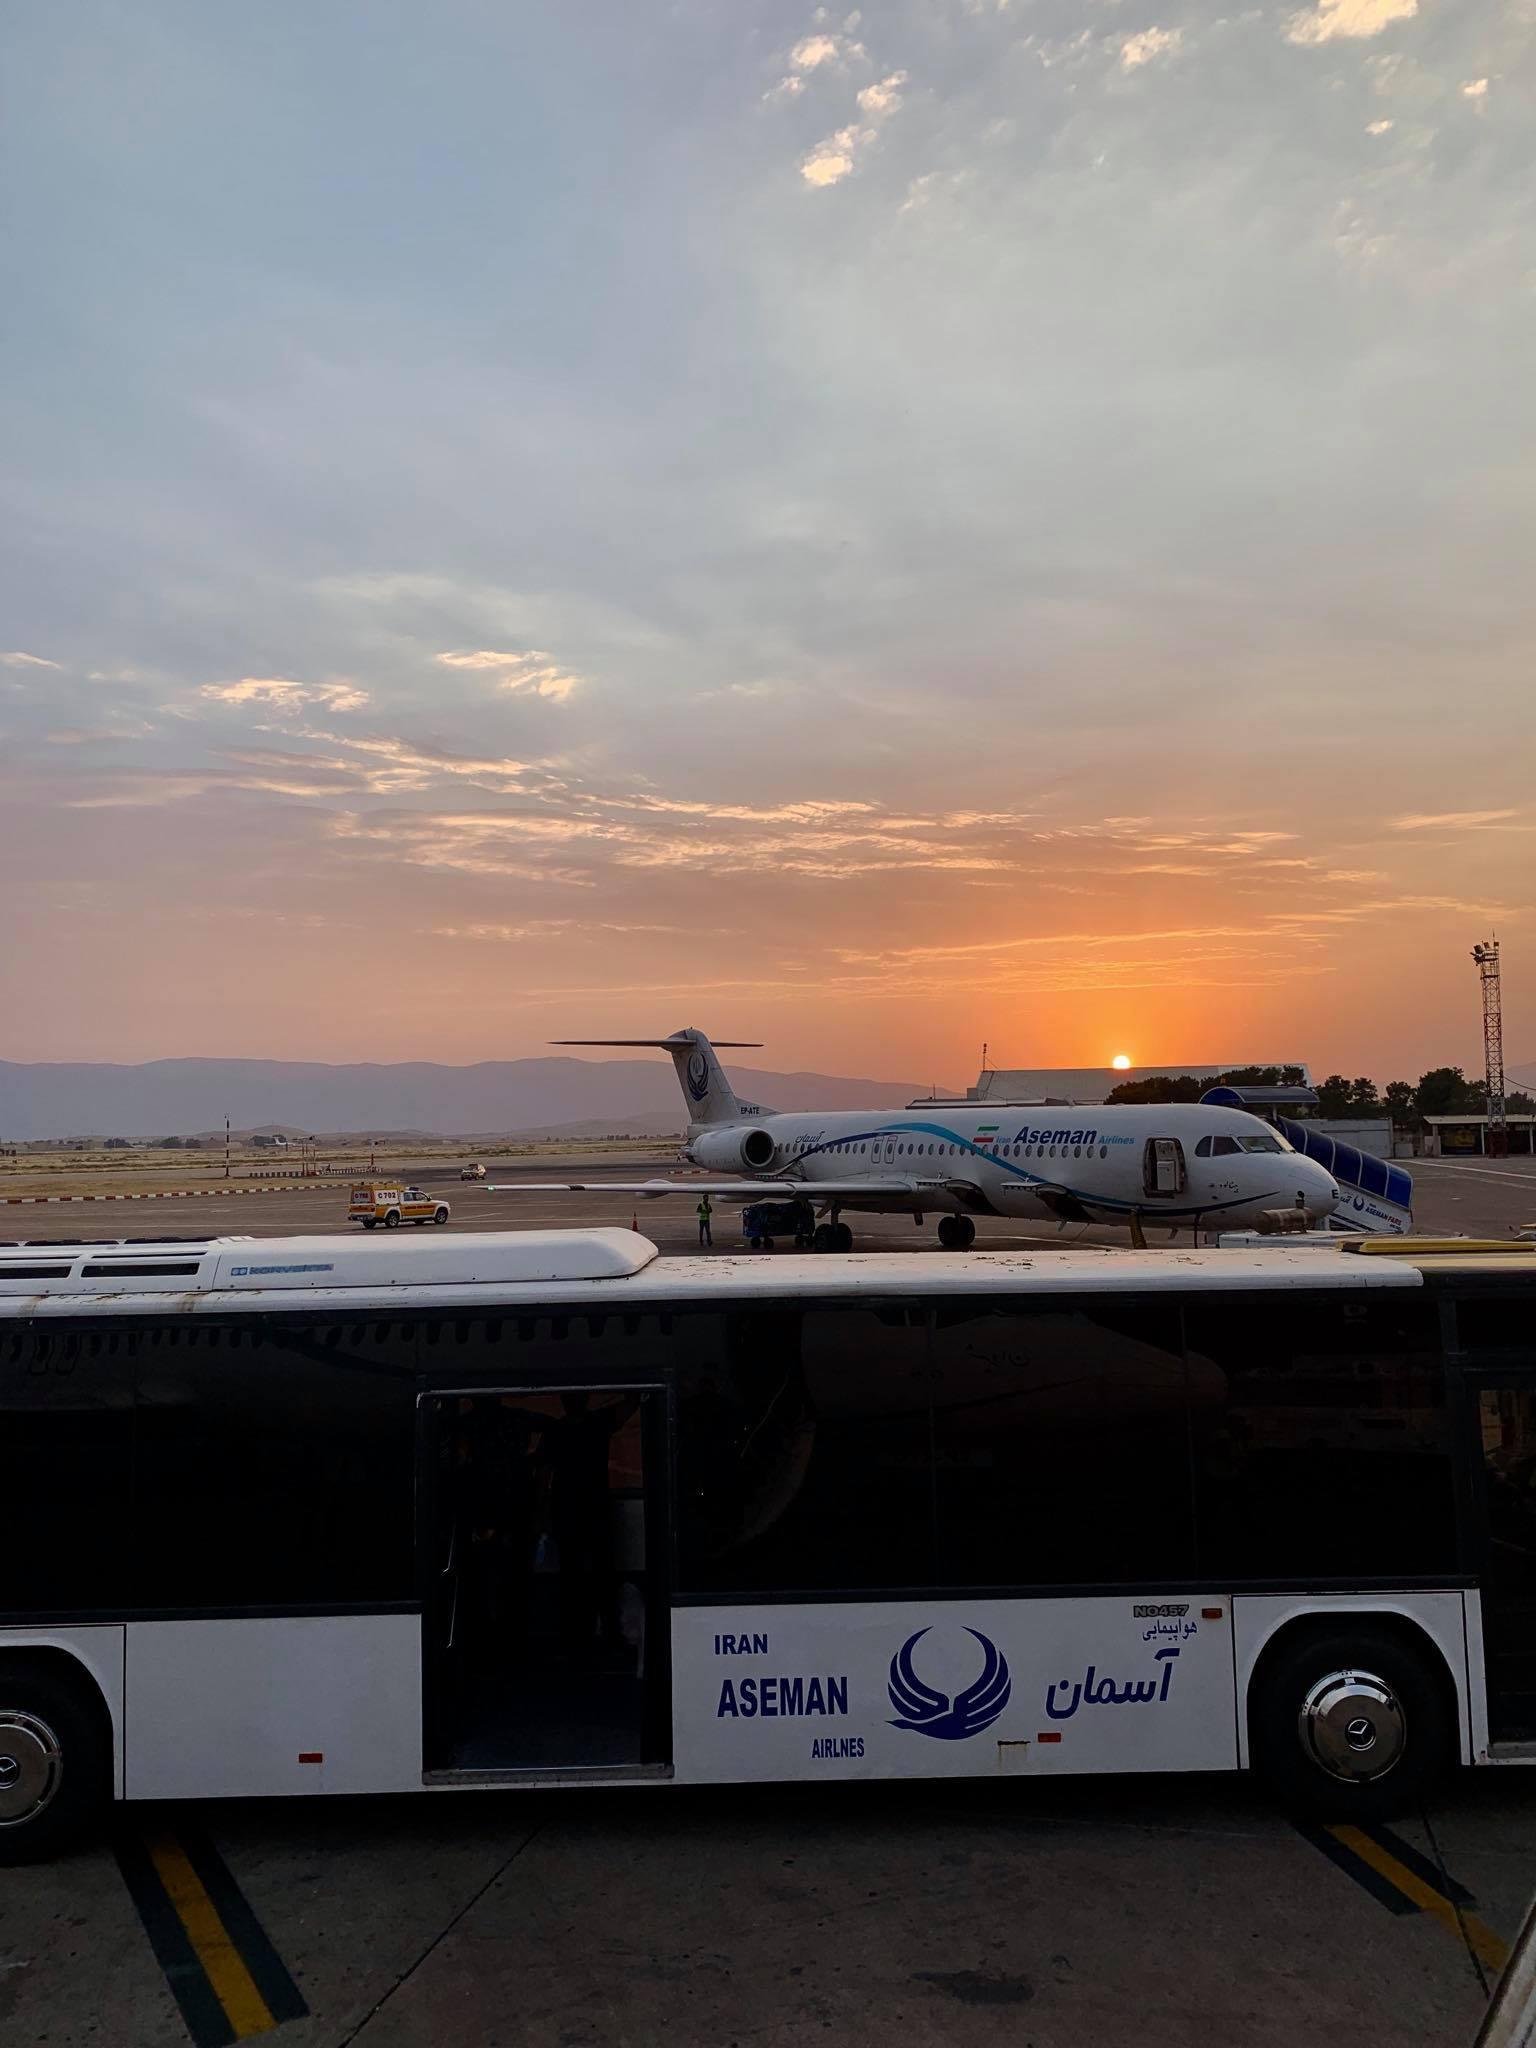 Kach Solo Travels in 2019 Mashhad to Shiraz9.jpg